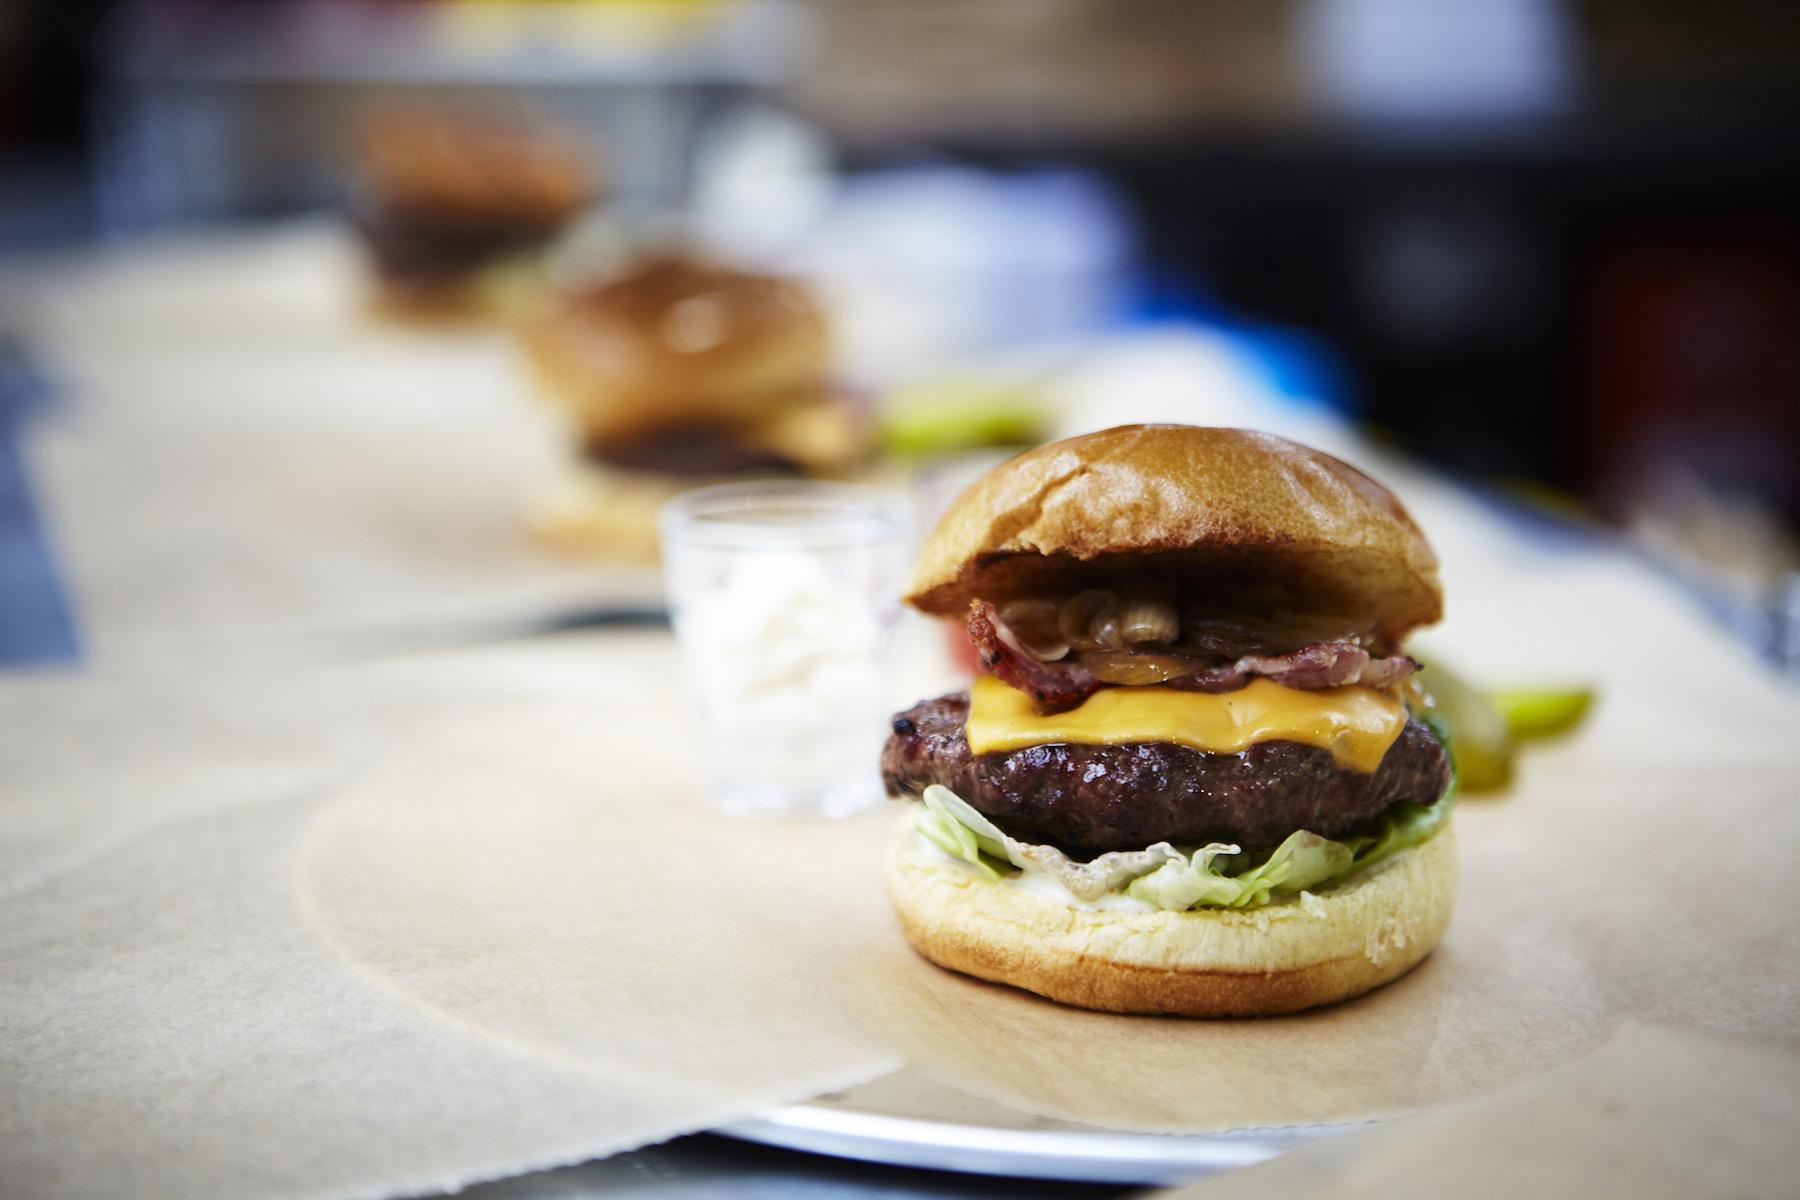 icon-artist-management-katie-hammond-food-burger_on_pass_390_ret_flat.jpg